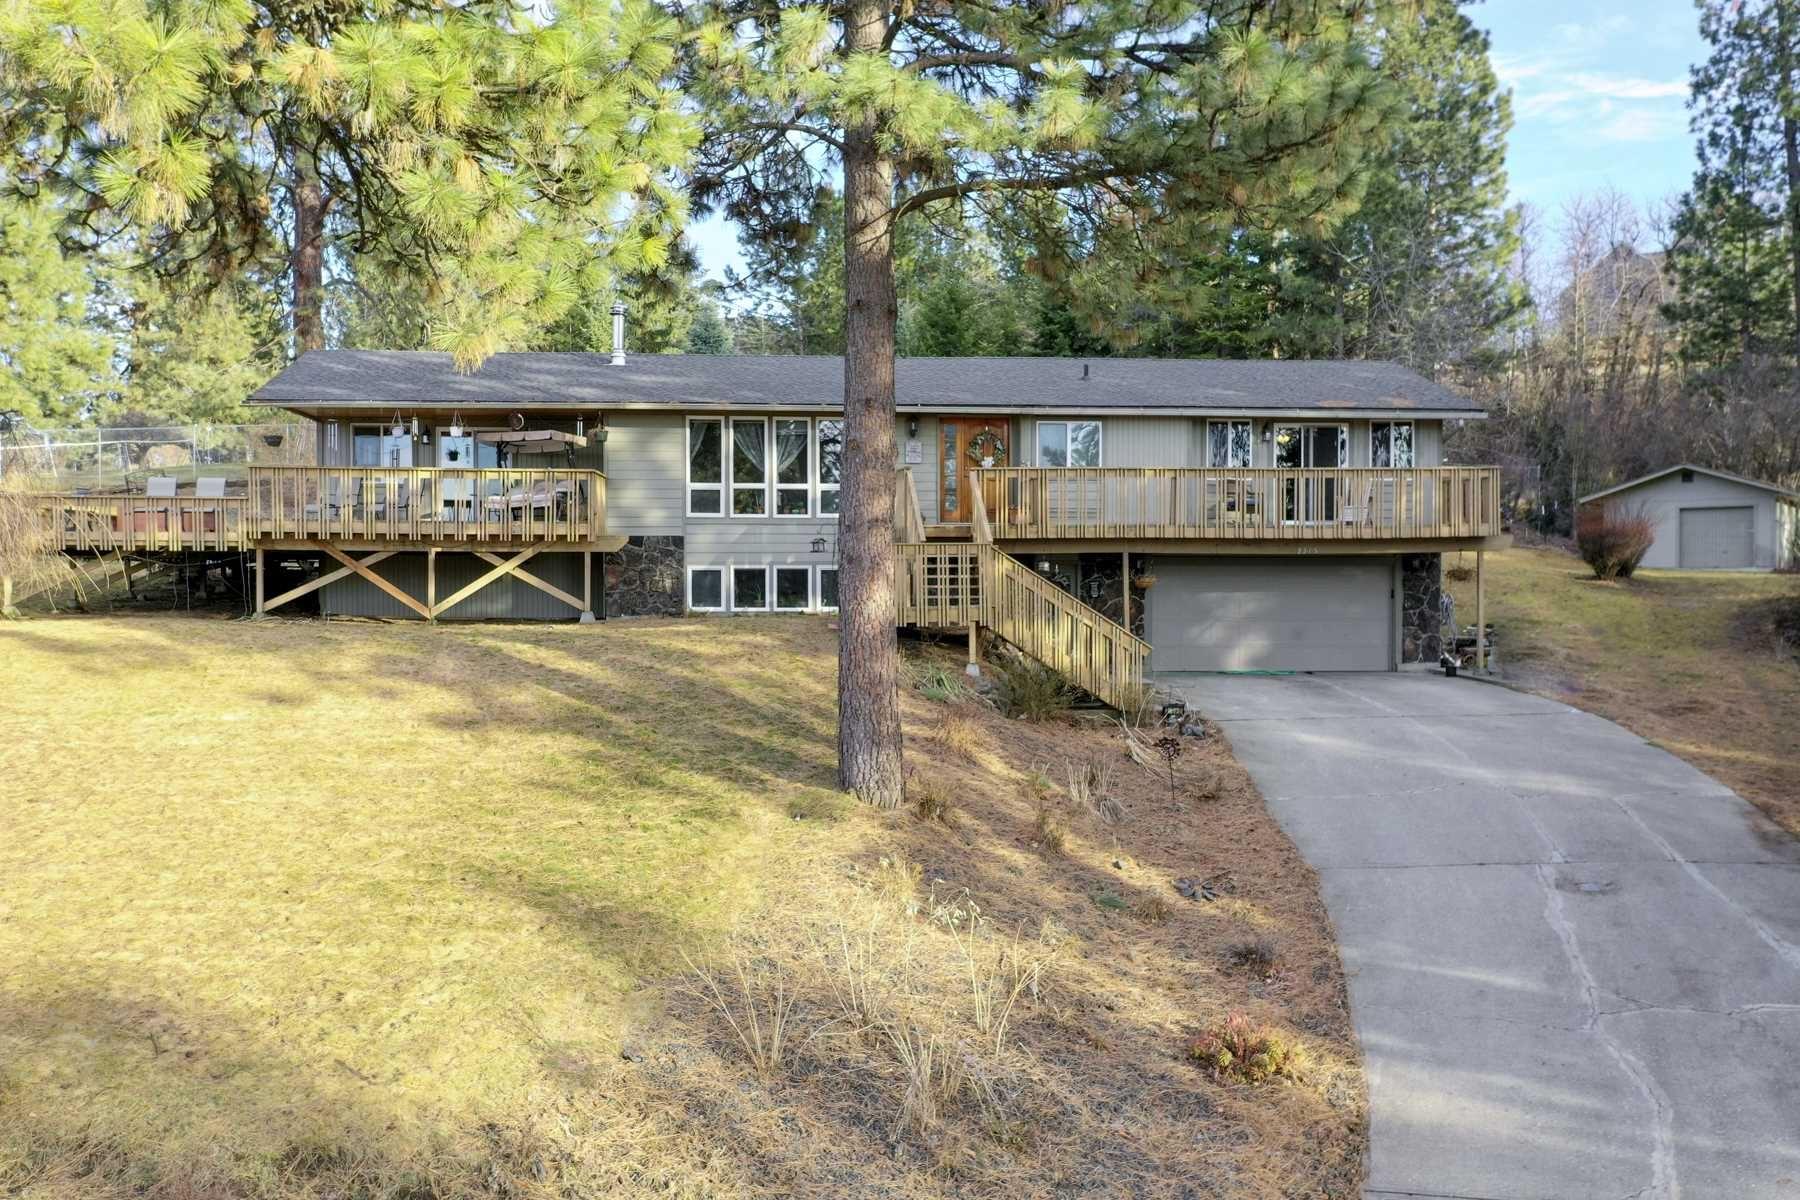 2315 S Carnine Ct, Spokane Valley, WA 99037-9002 - #: 202112214